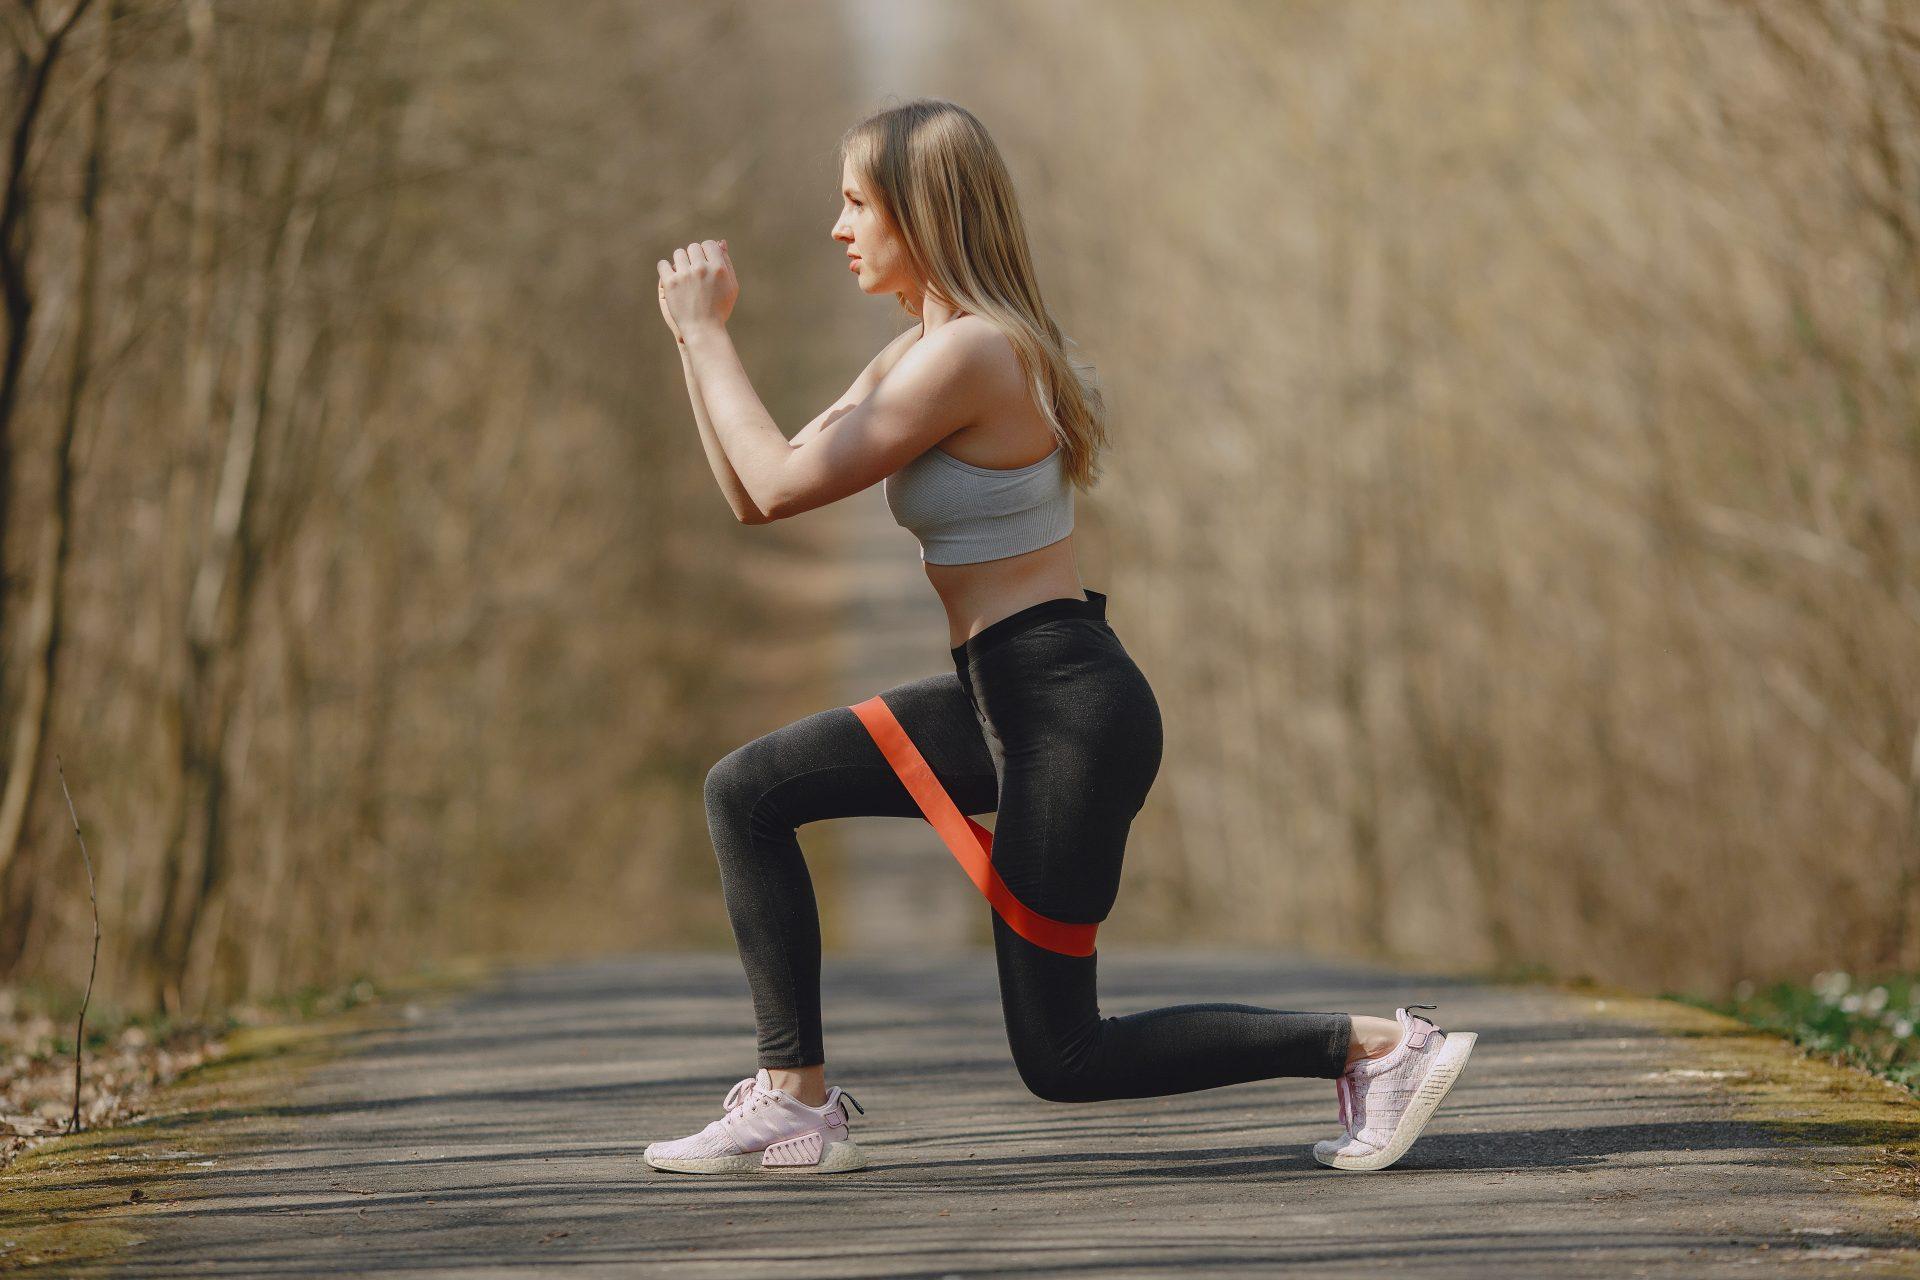 Resistance Training Builds Stronger Bones